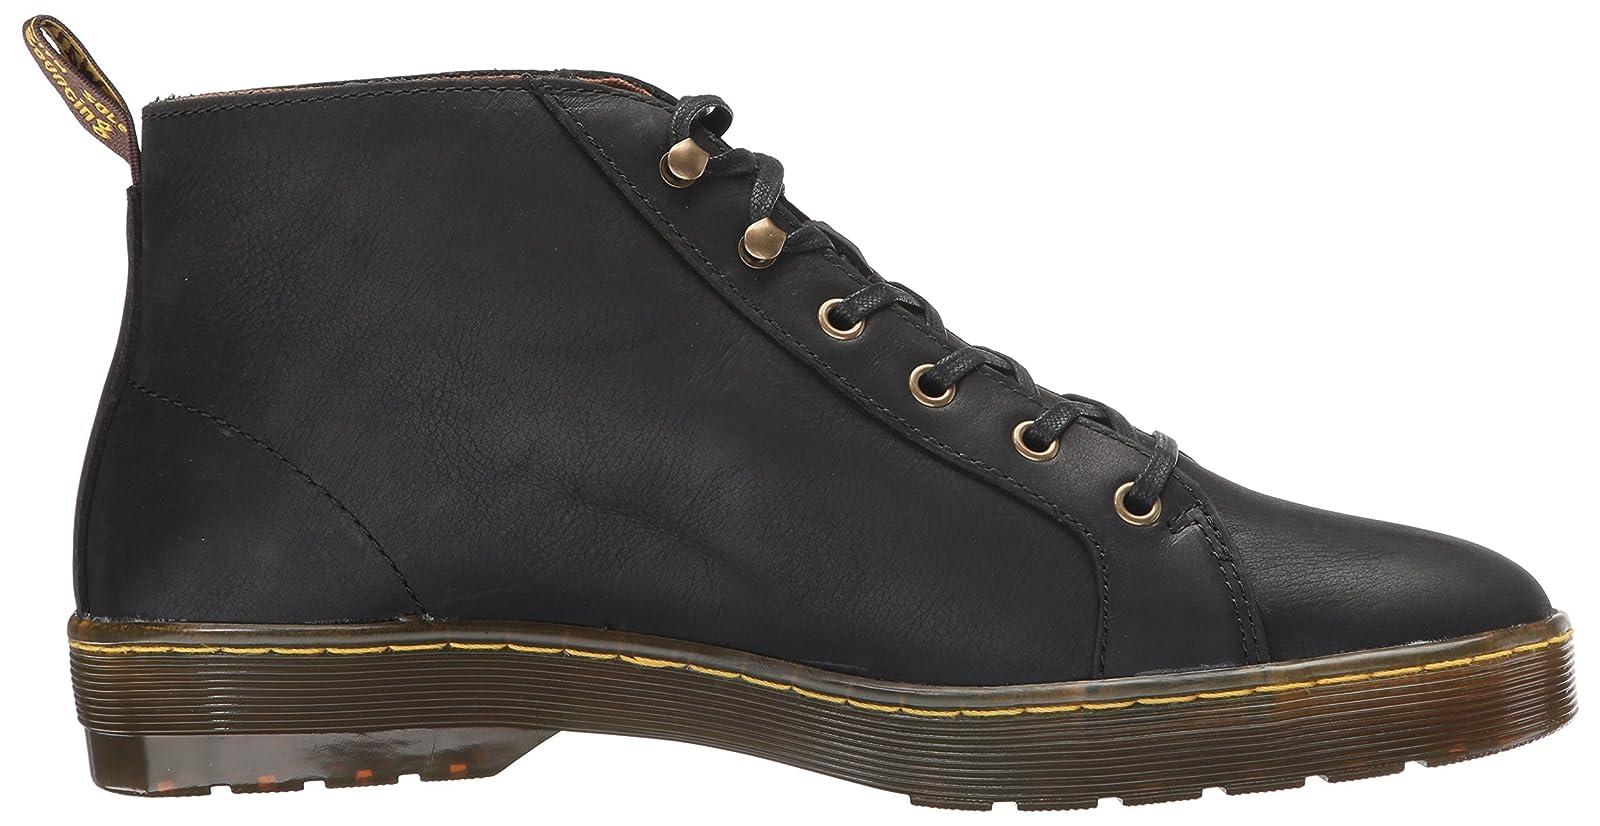 Dr. Martens Men's Coburg Wyoming Chukka Boot 9 M US - 7